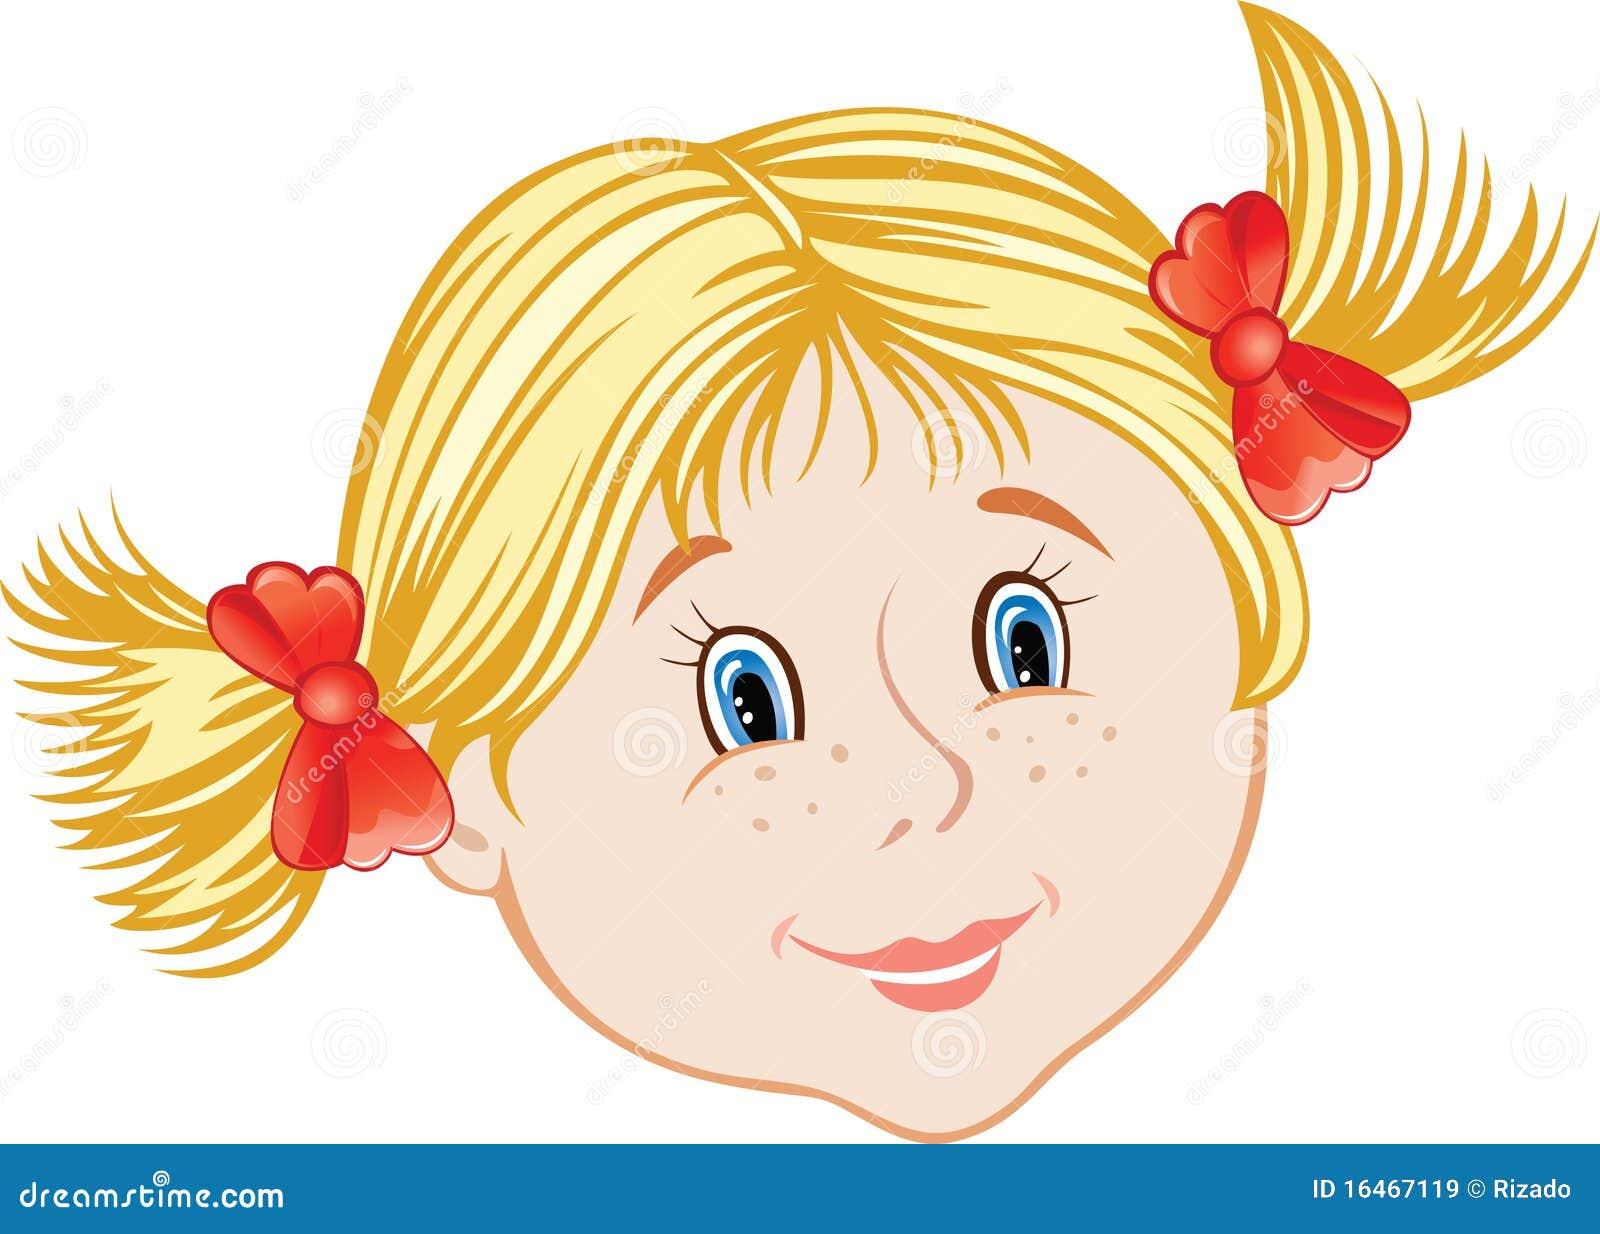 visage de petite fille illustration de vecteur illustration du people 16467119. Black Bedroom Furniture Sets. Home Design Ideas